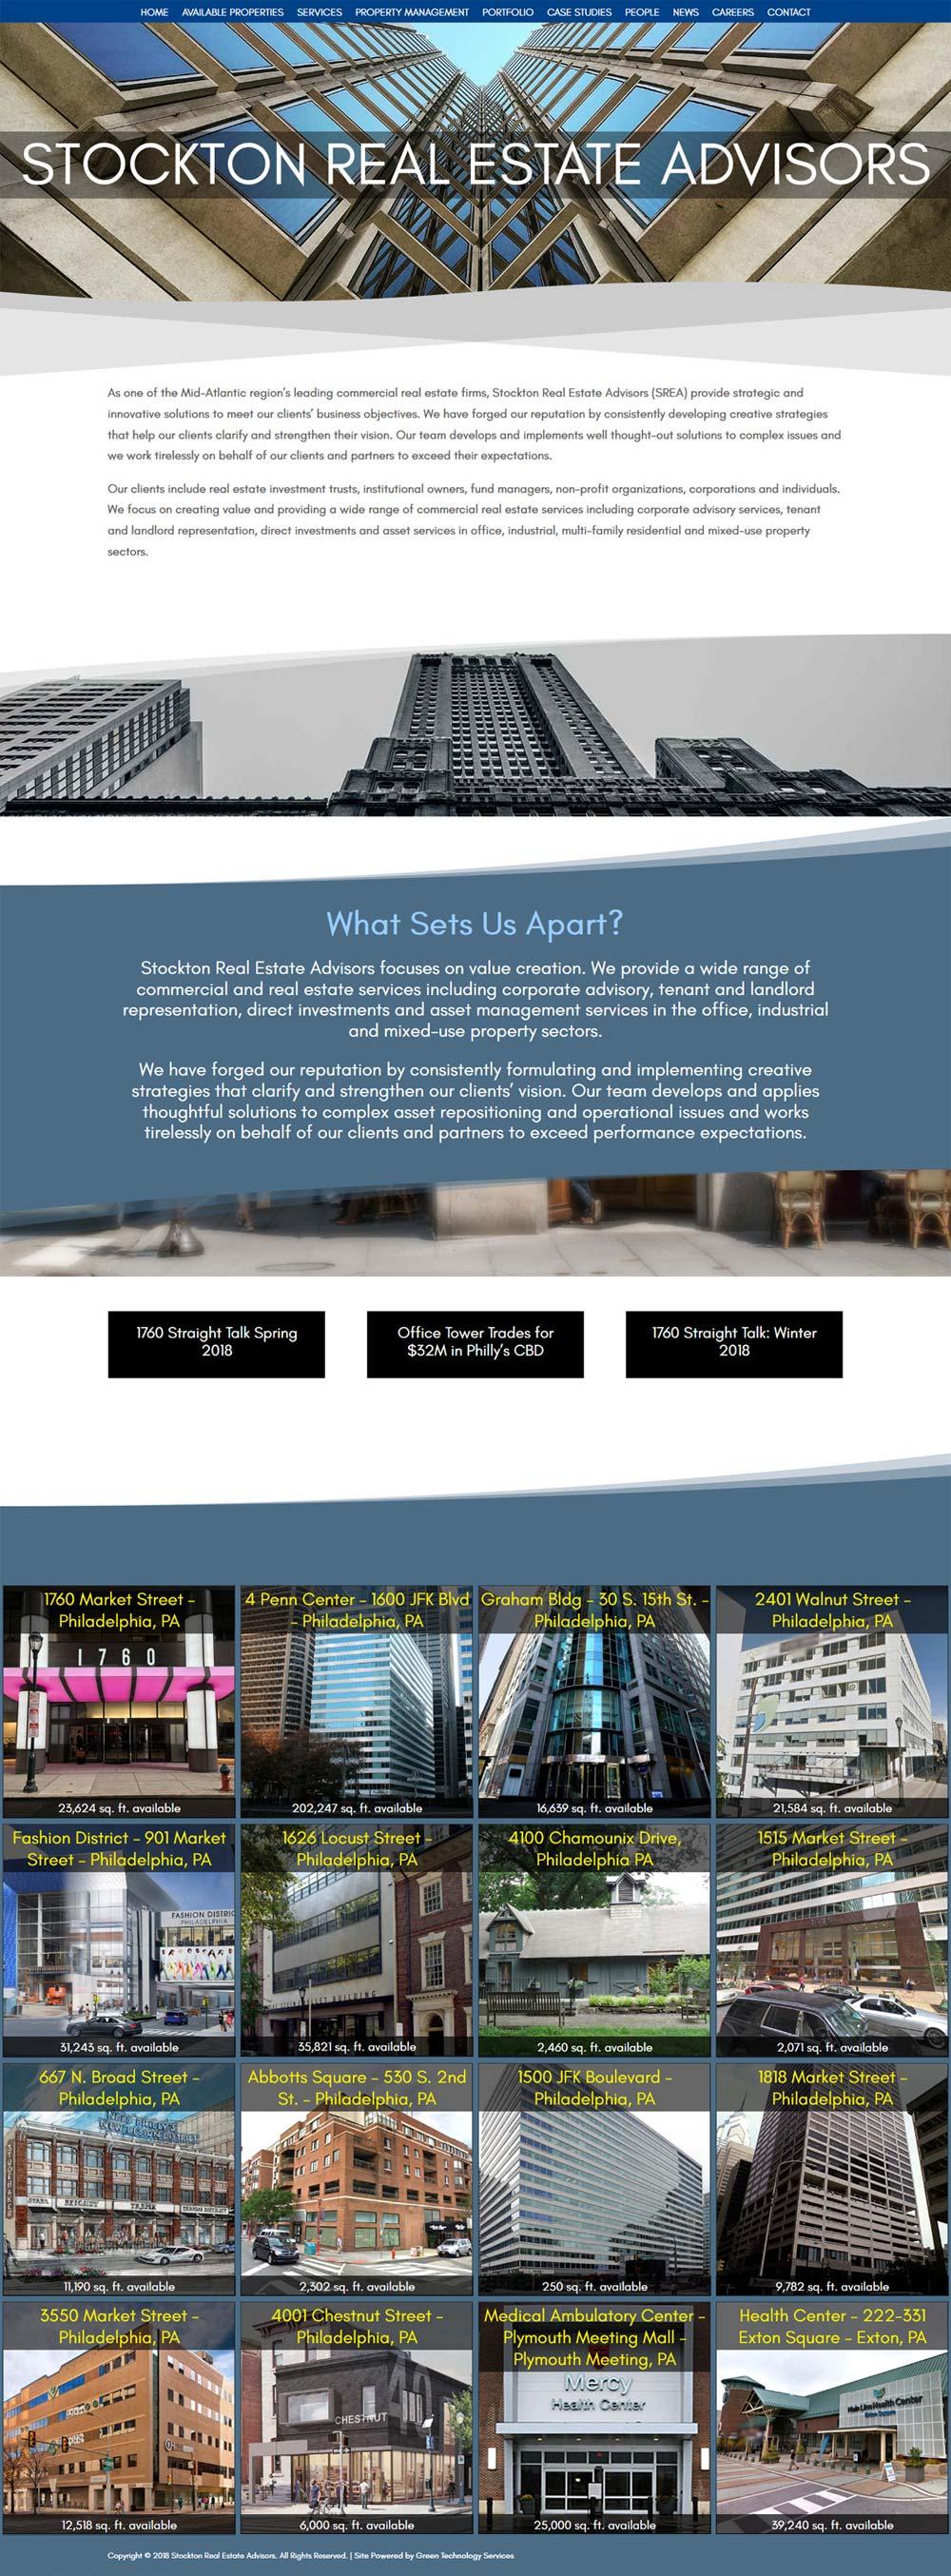 Stockton Real Estate Advisors 1 - Commercial Real Estate Firm